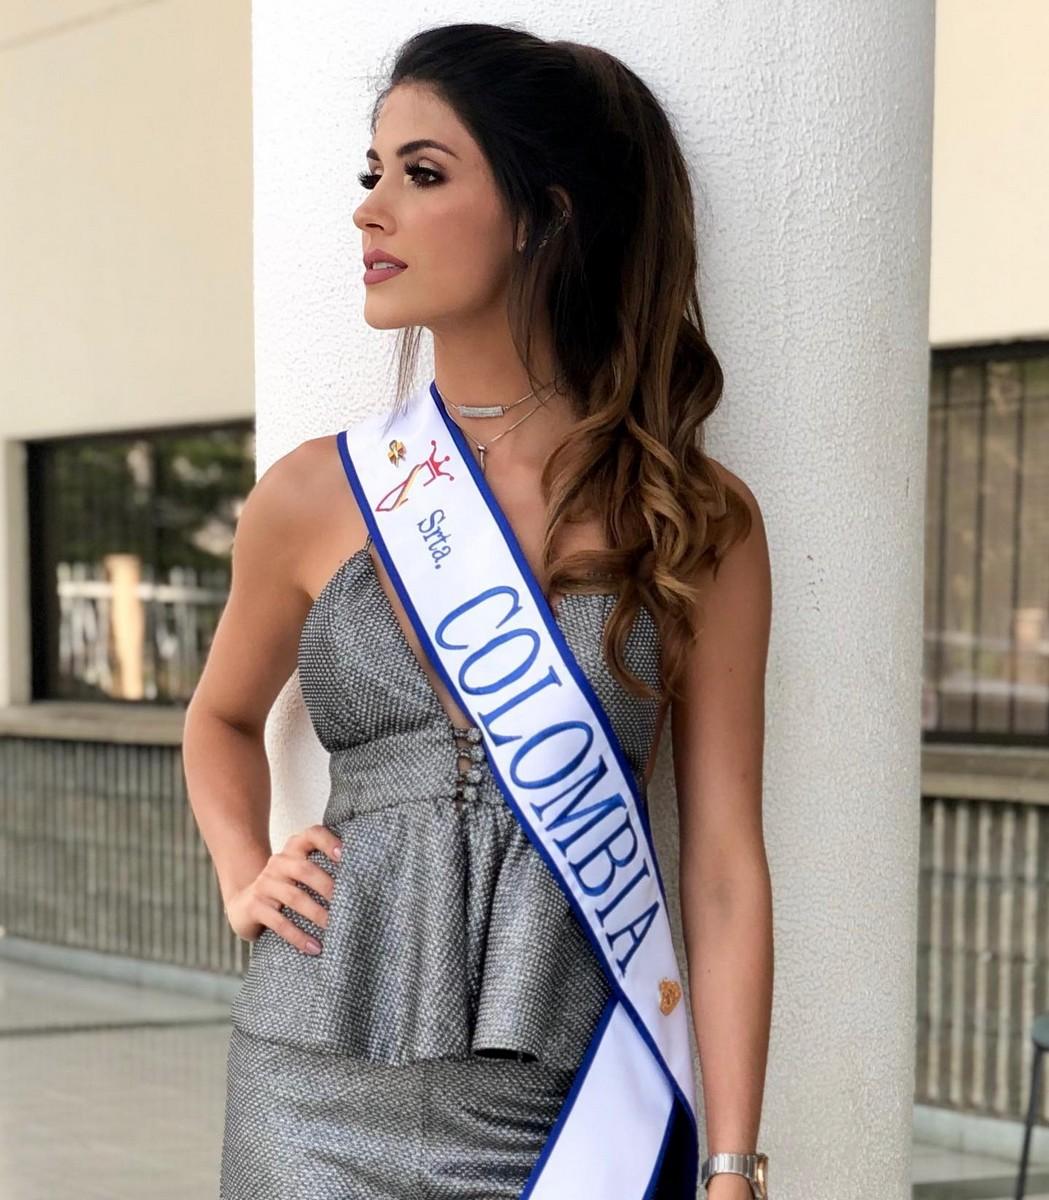 gabriela tafur, top 5 de miss universe 2019. - Página 4 Gabrie30